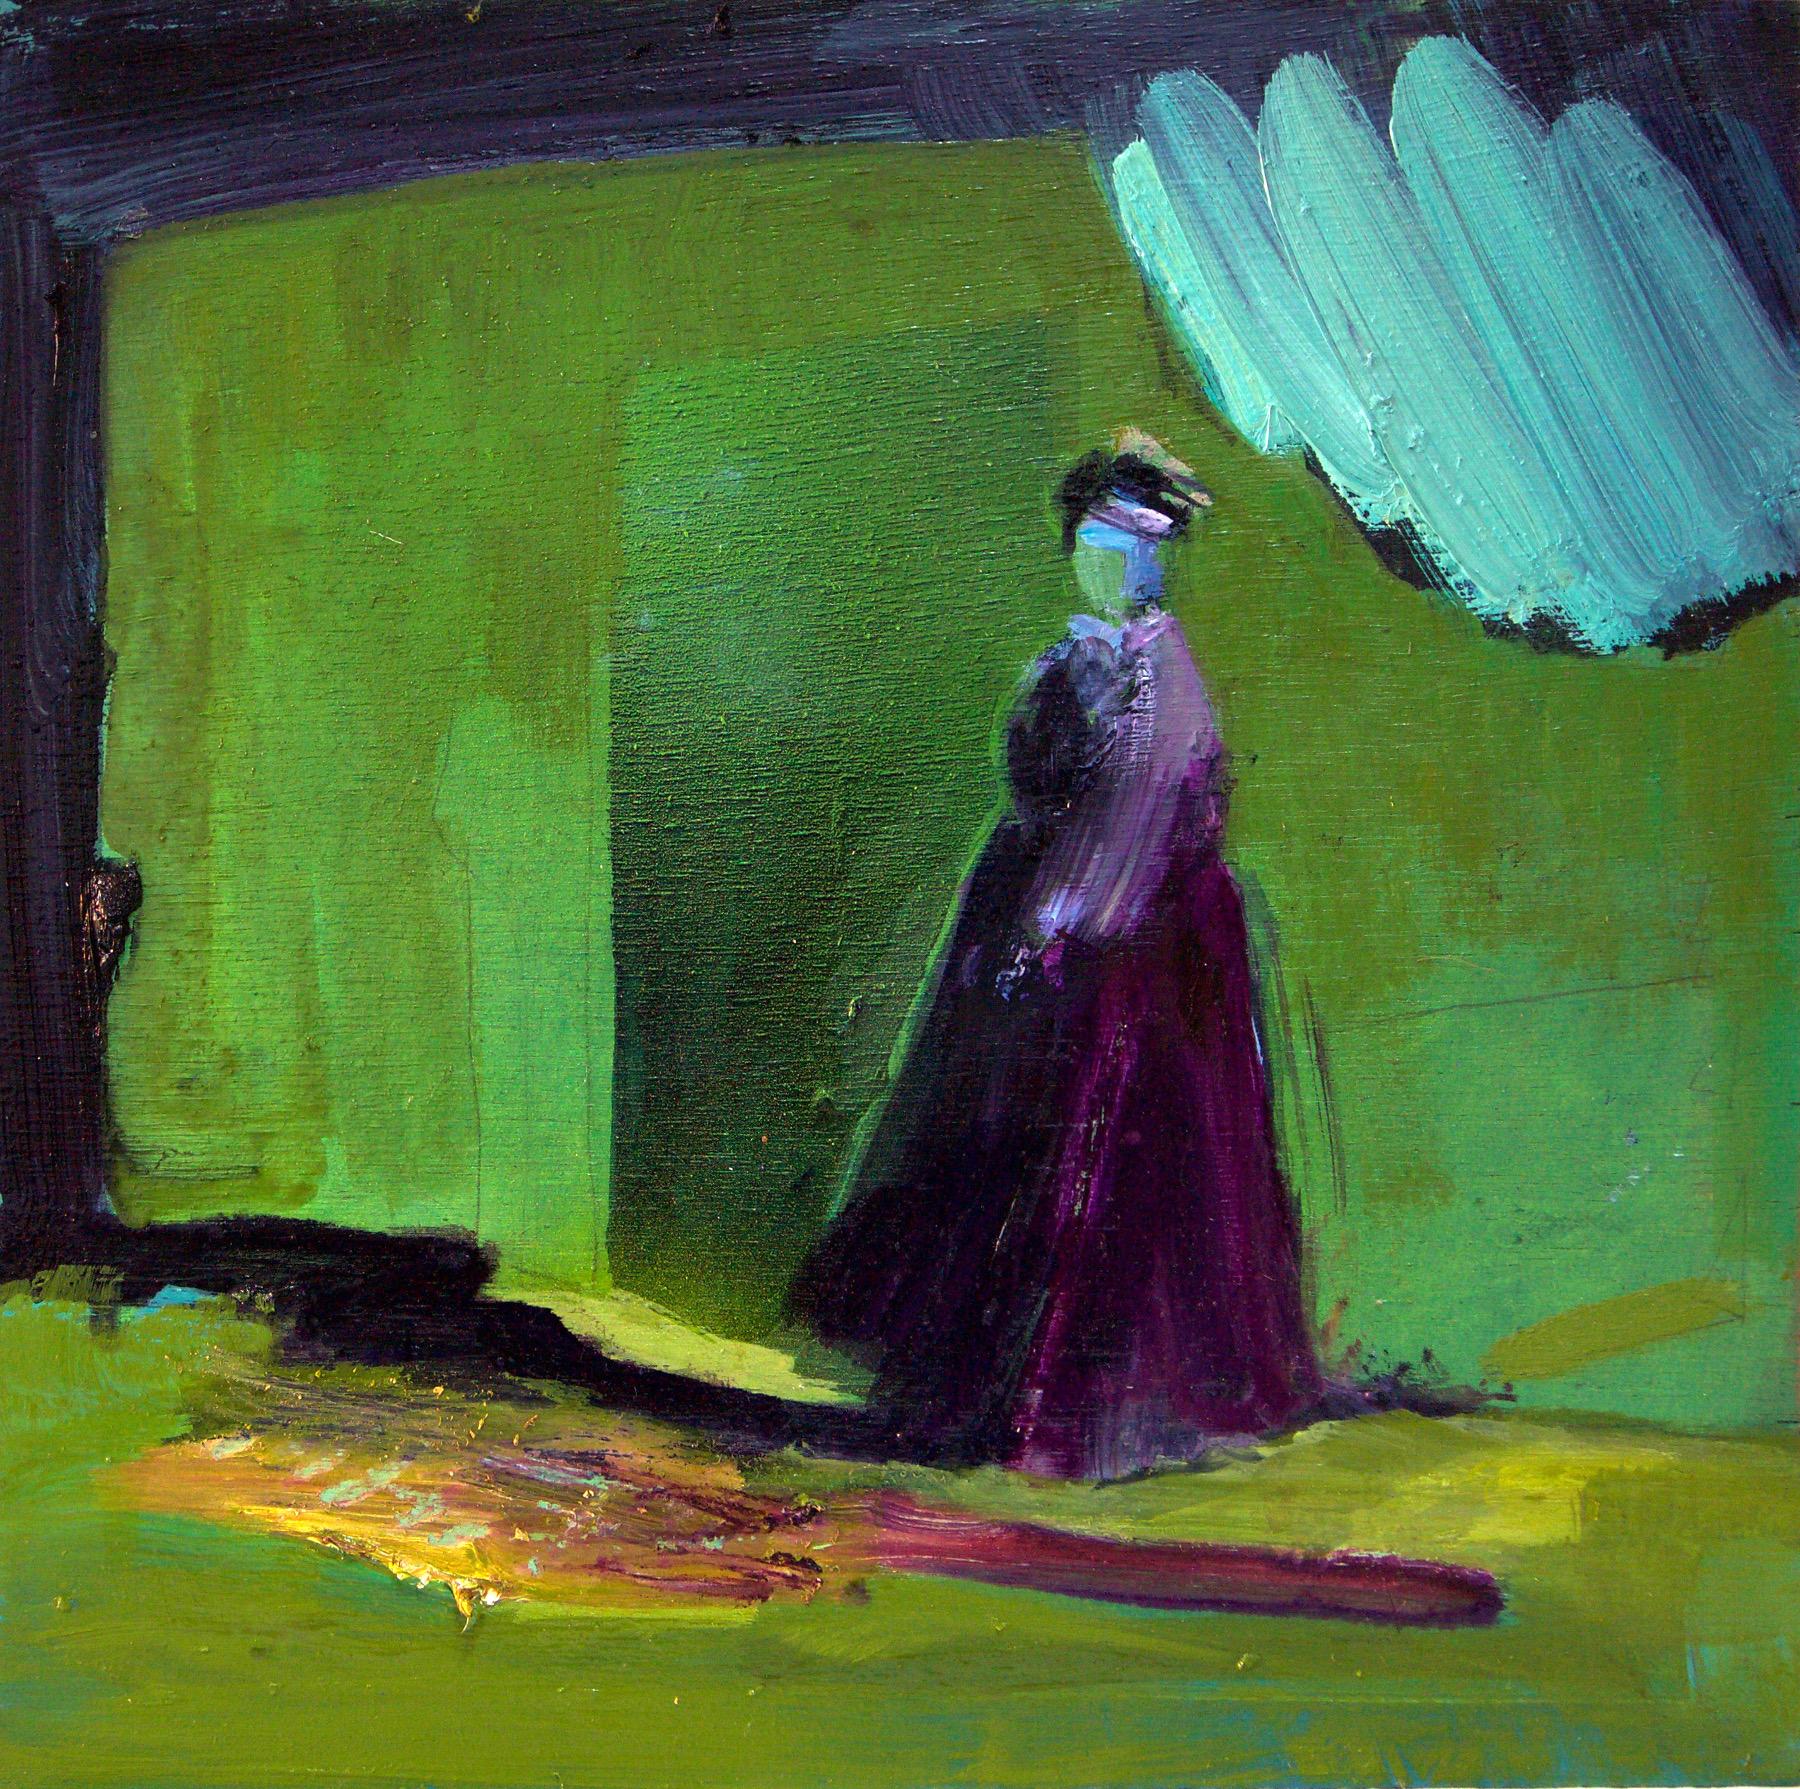 Kathryn Cowen, Guide, 2017, acrylic, oil and aerosol paint on board, 30 x 30cm